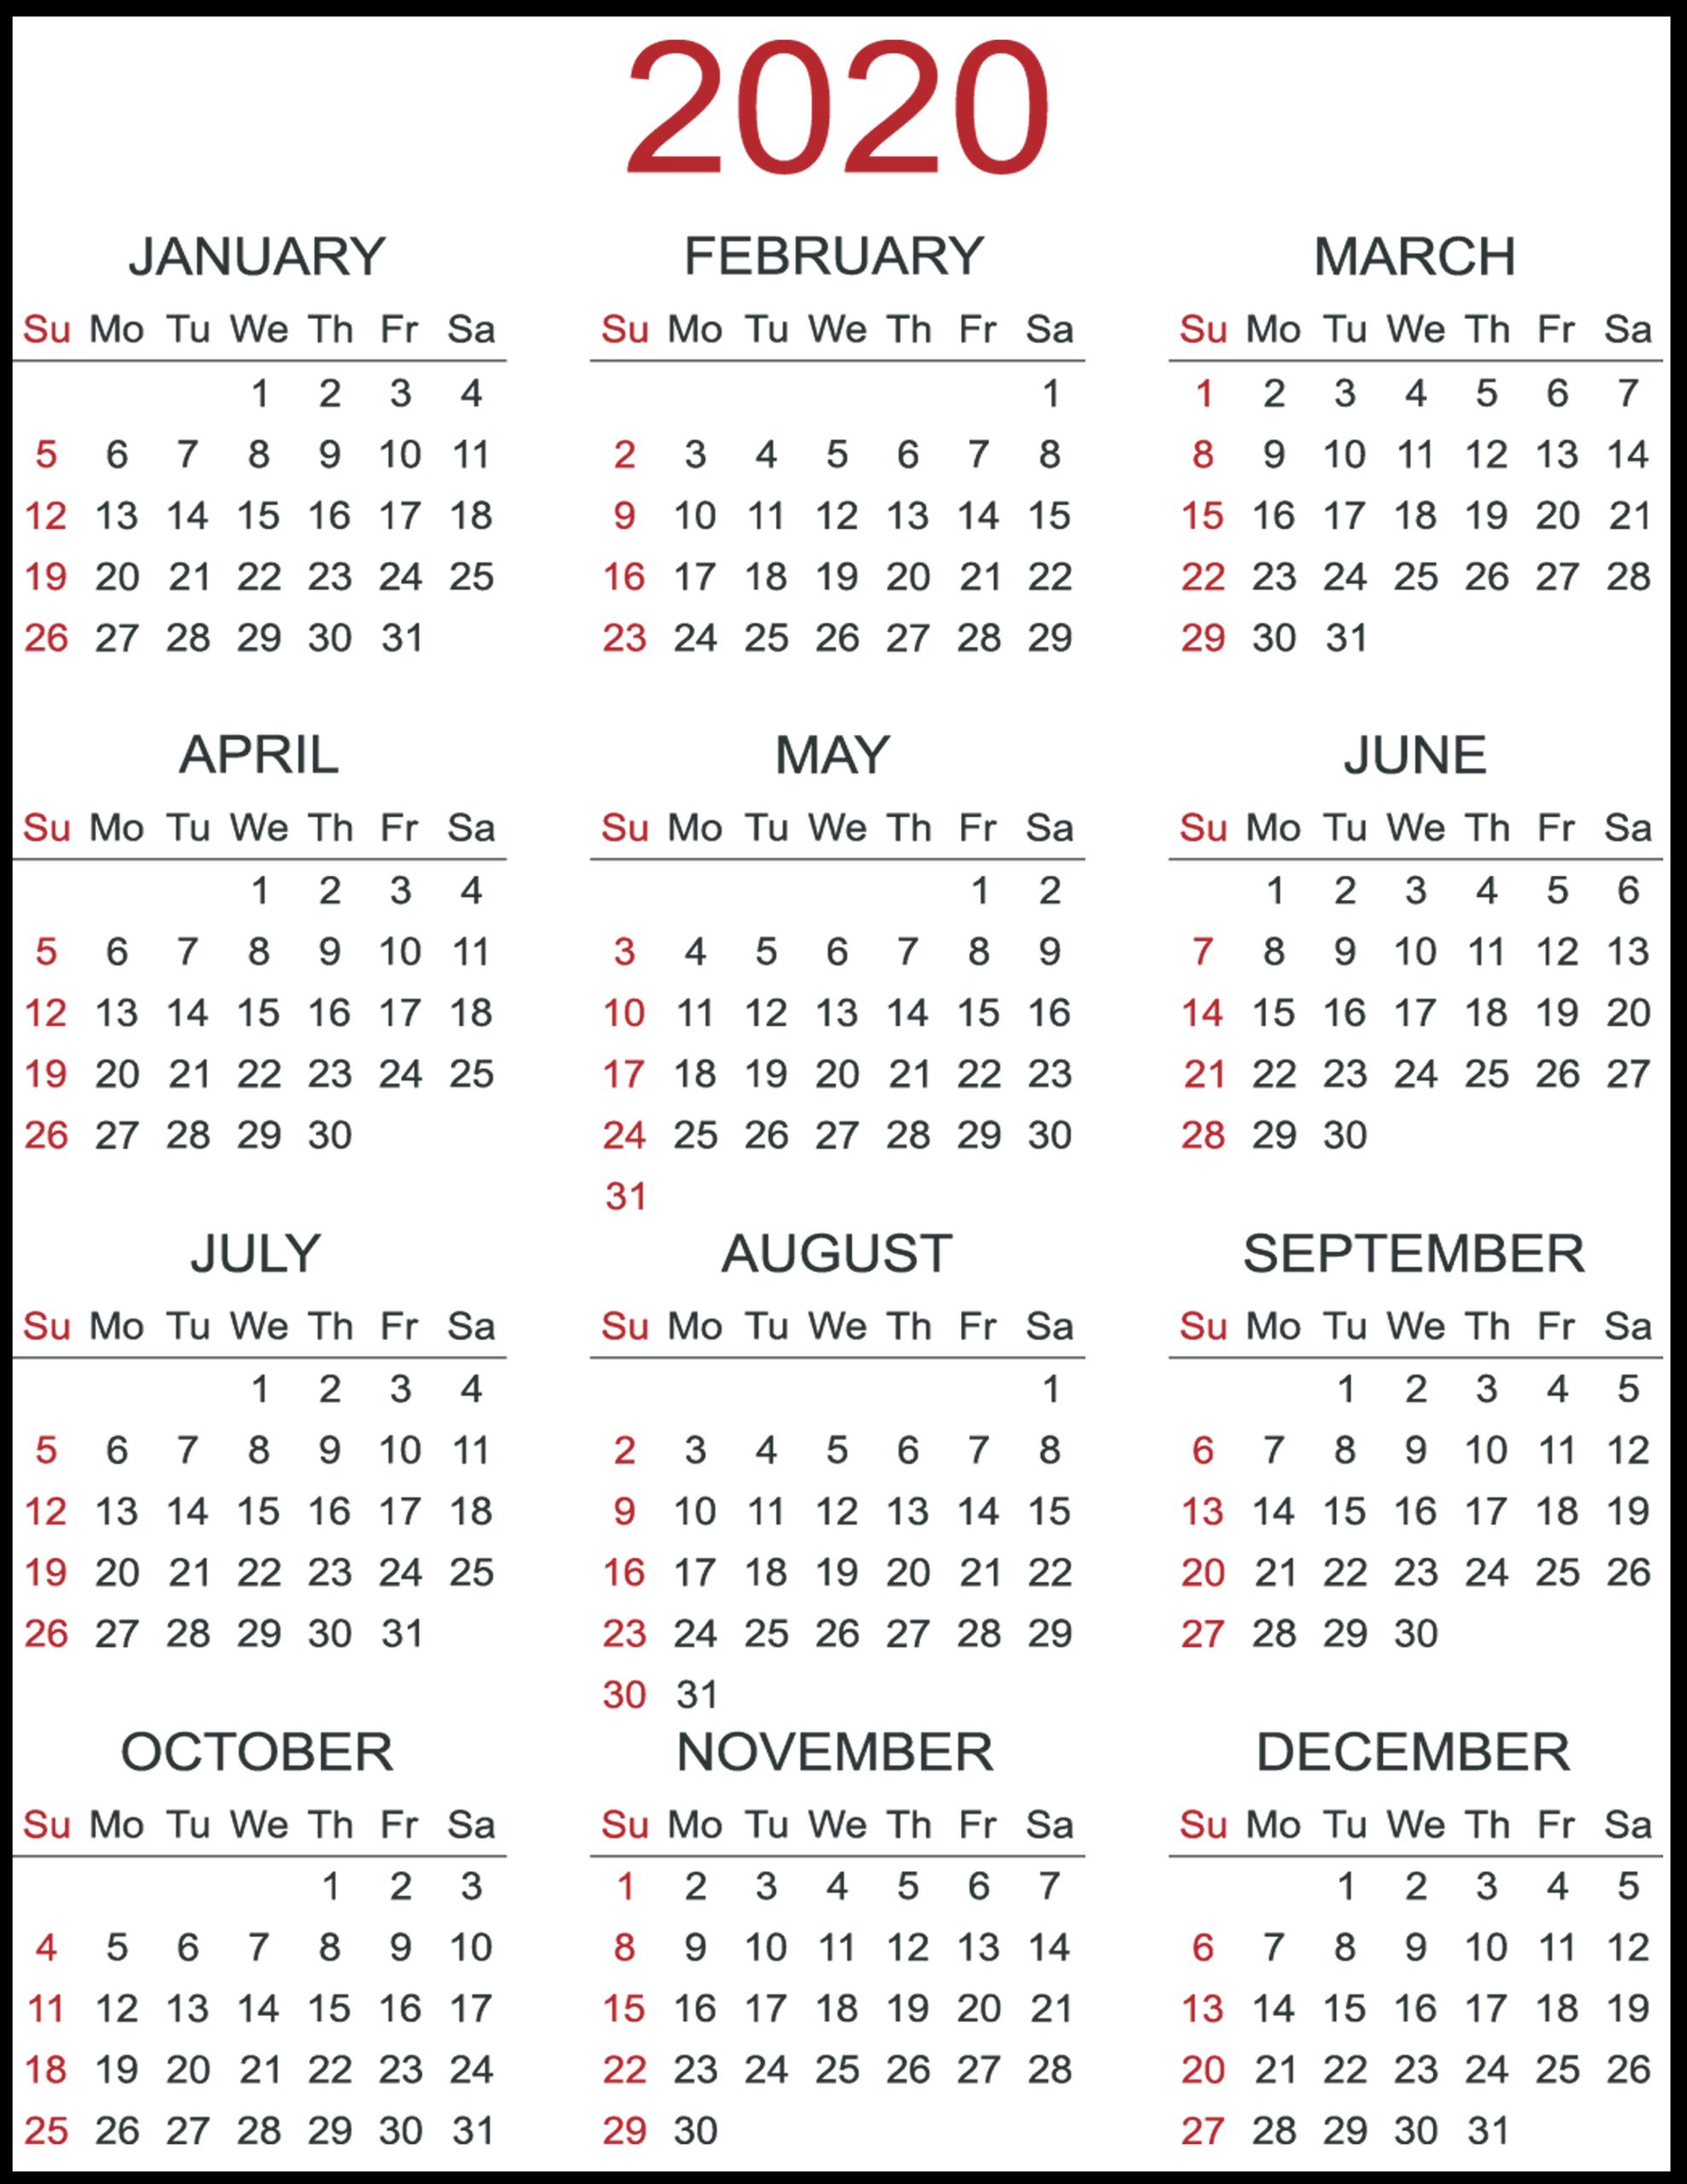 2020 Calendar Hk Excel | Calendar For Planning throughout Lunar Hair Cutting Chart 2021 Morrocco